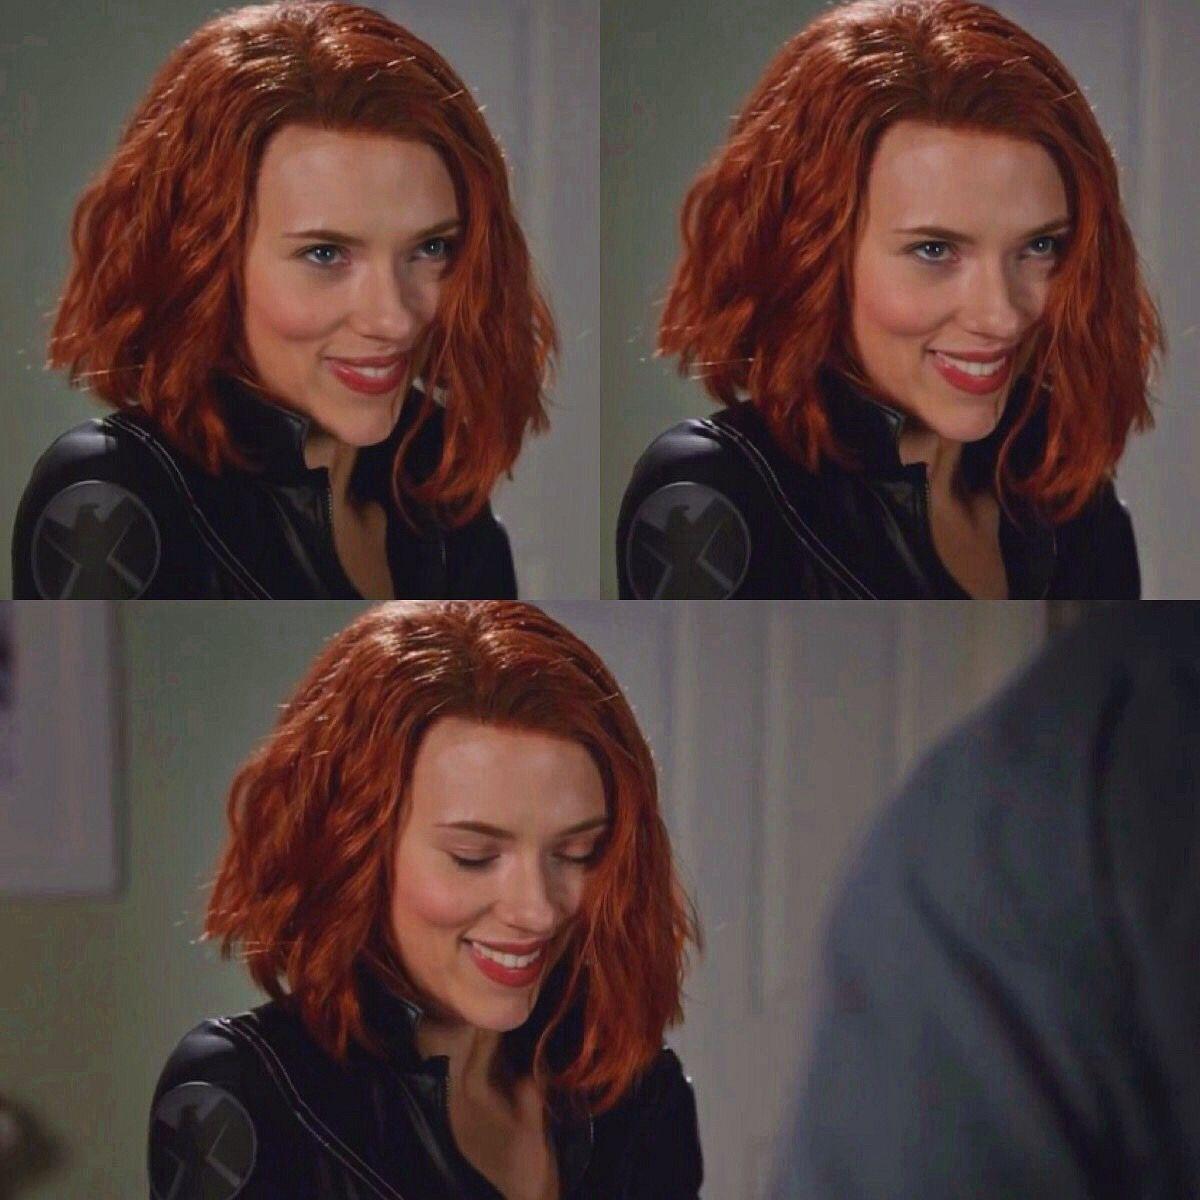 Scarlett Johansson For Black Widow Trailer Snl Scarlett Johansson Hairstyle Black Widow Scarlett Black Widow Trailer